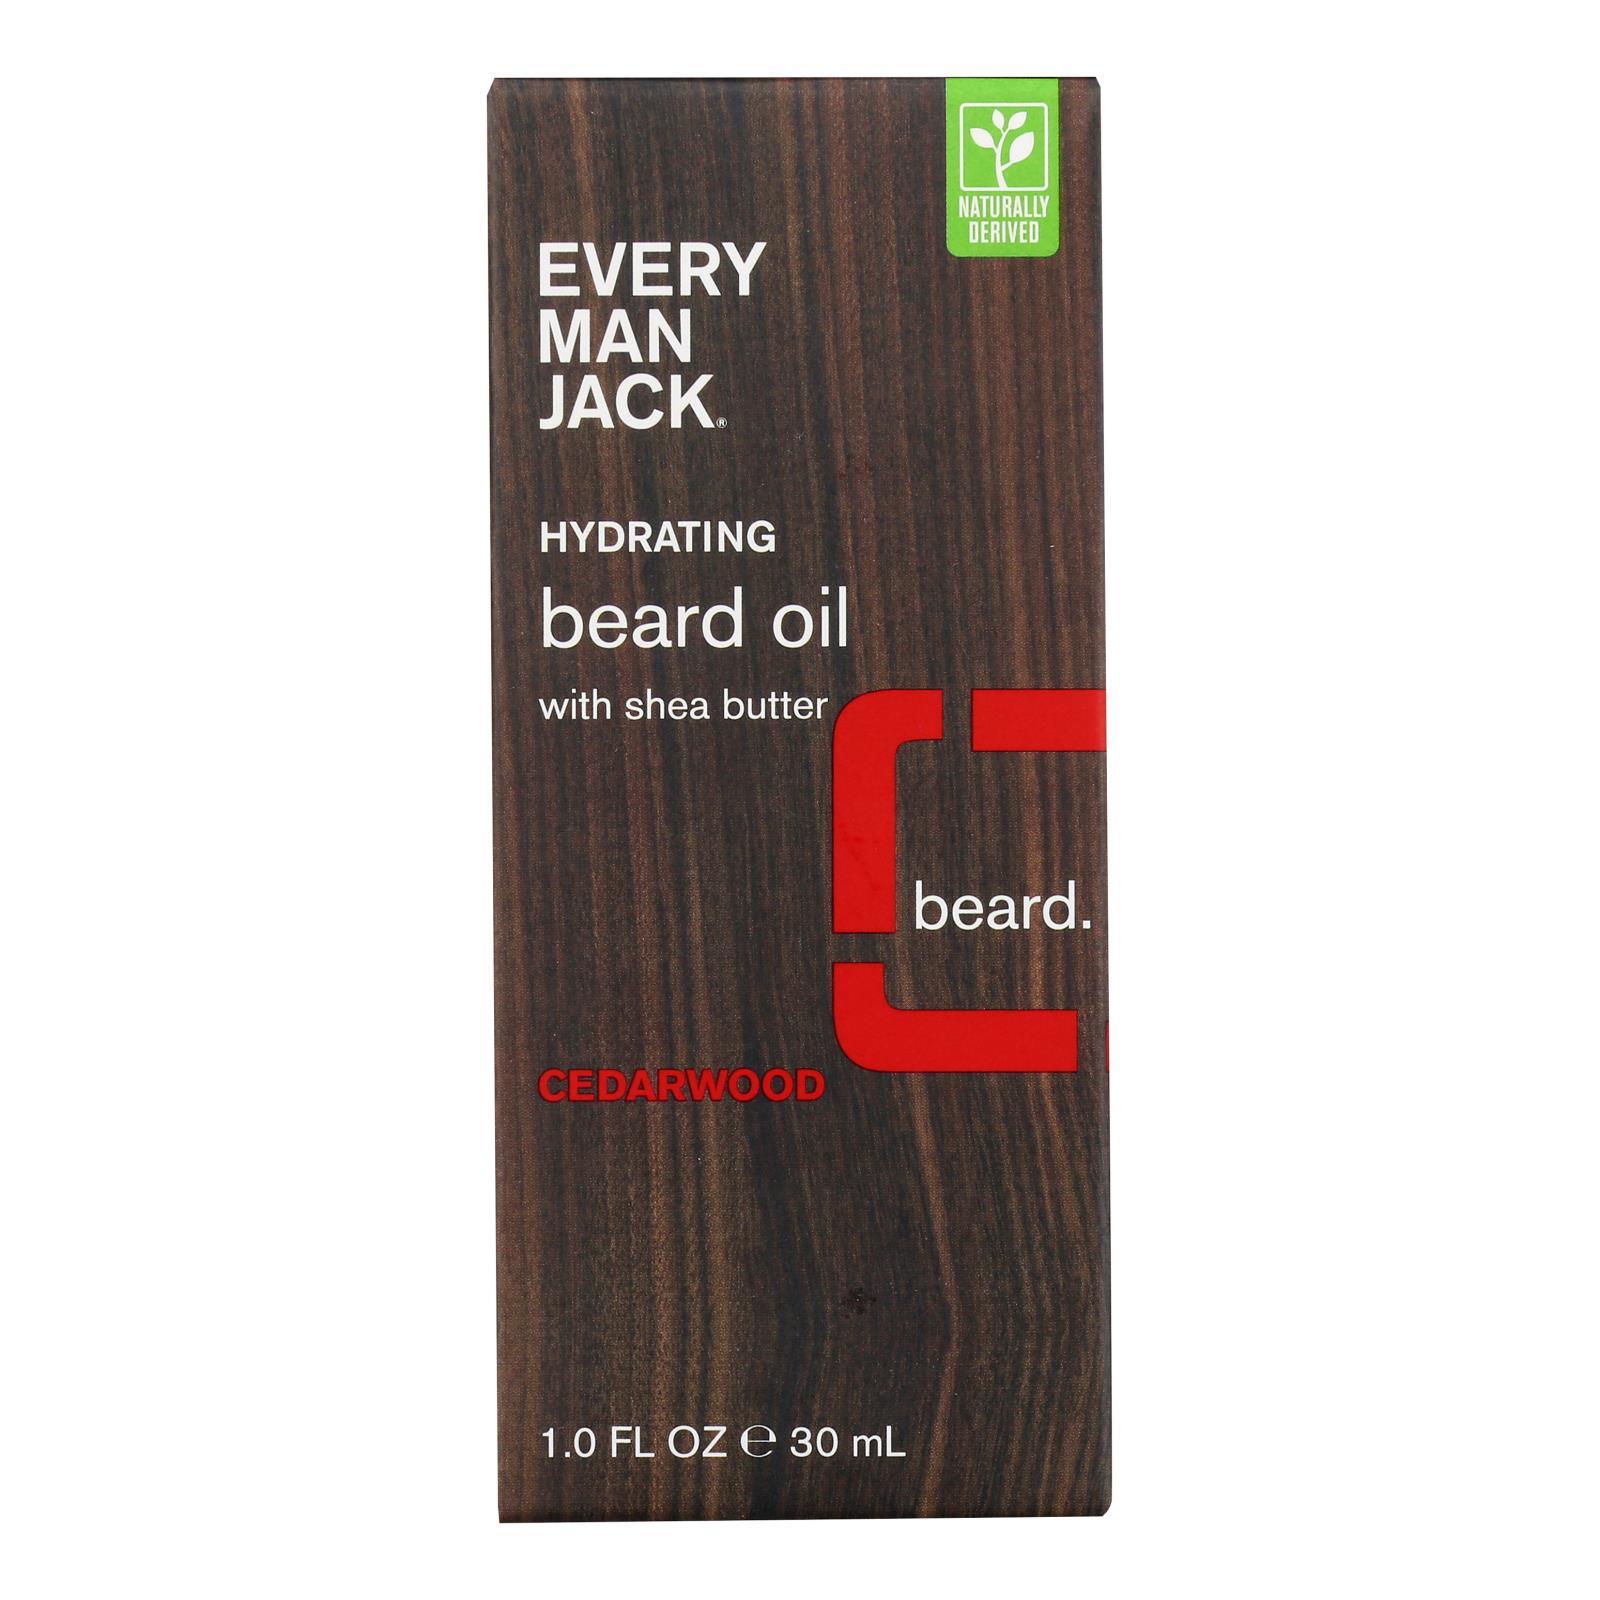 Every Man Jack Beard Oil - Cedar wood - 1 oz.